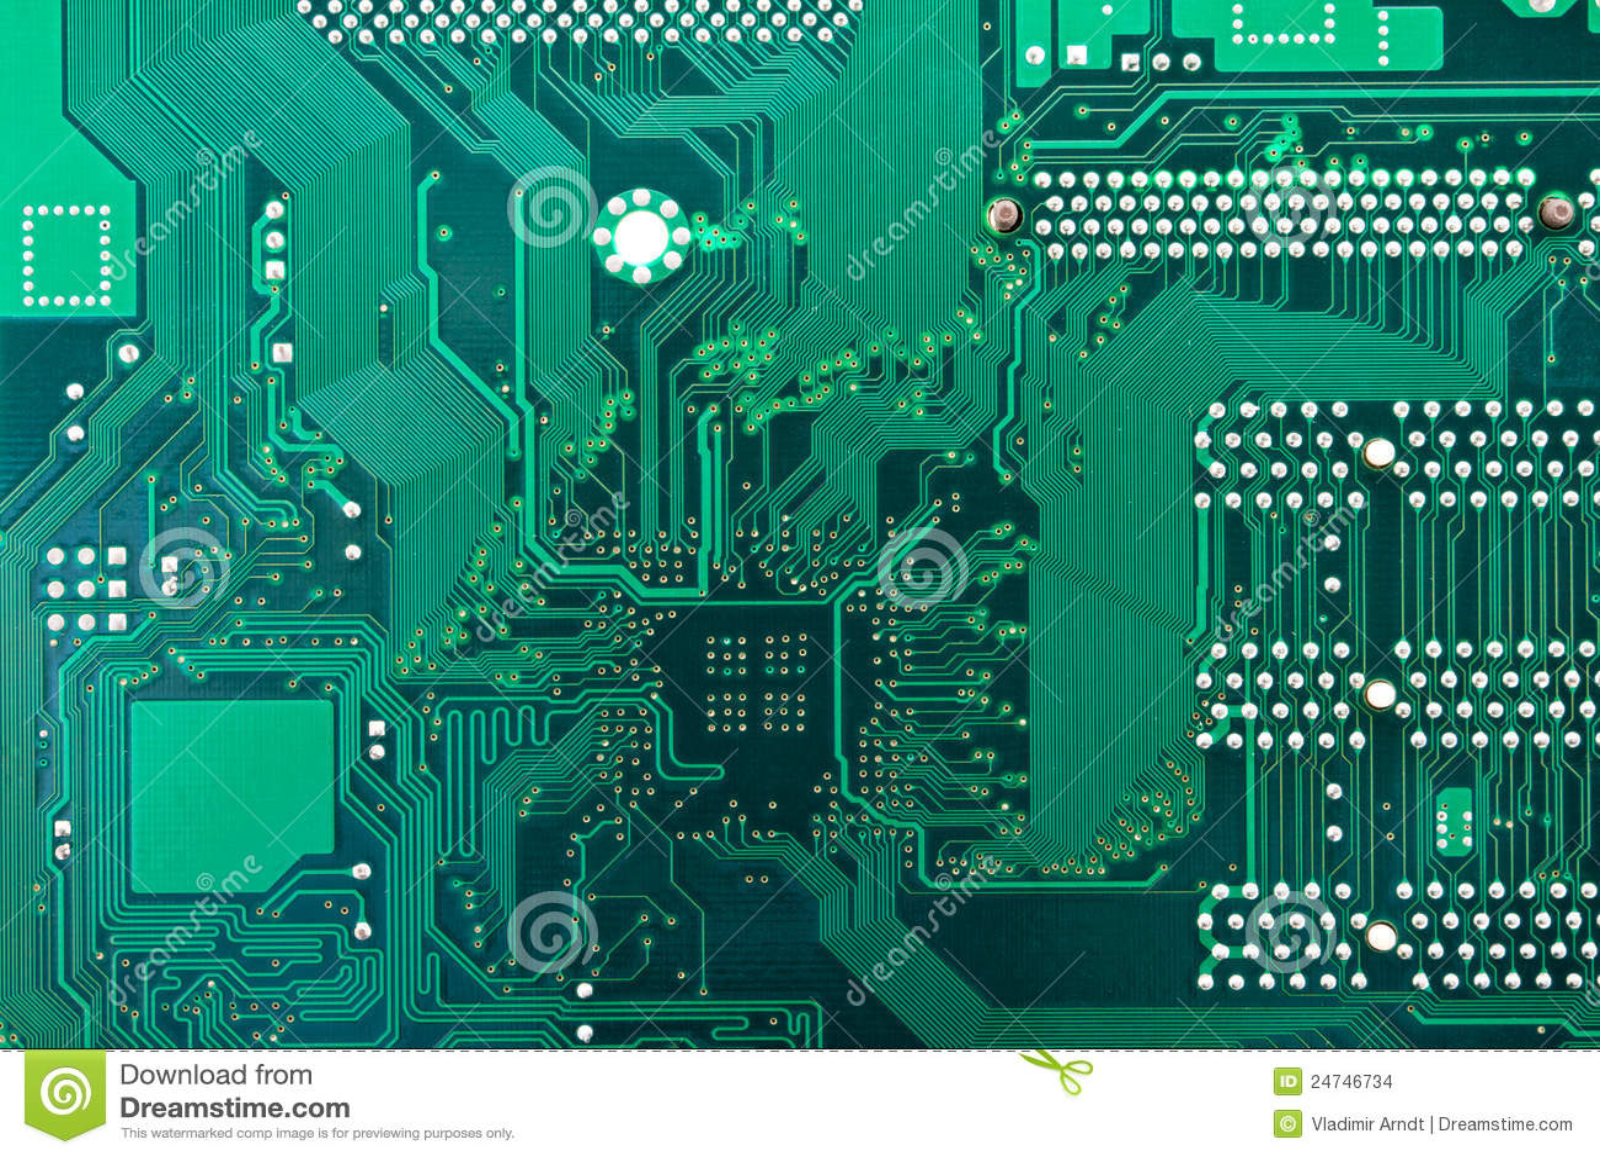 Green Circuit Board Royalty Free Stock Photo Image 27694475